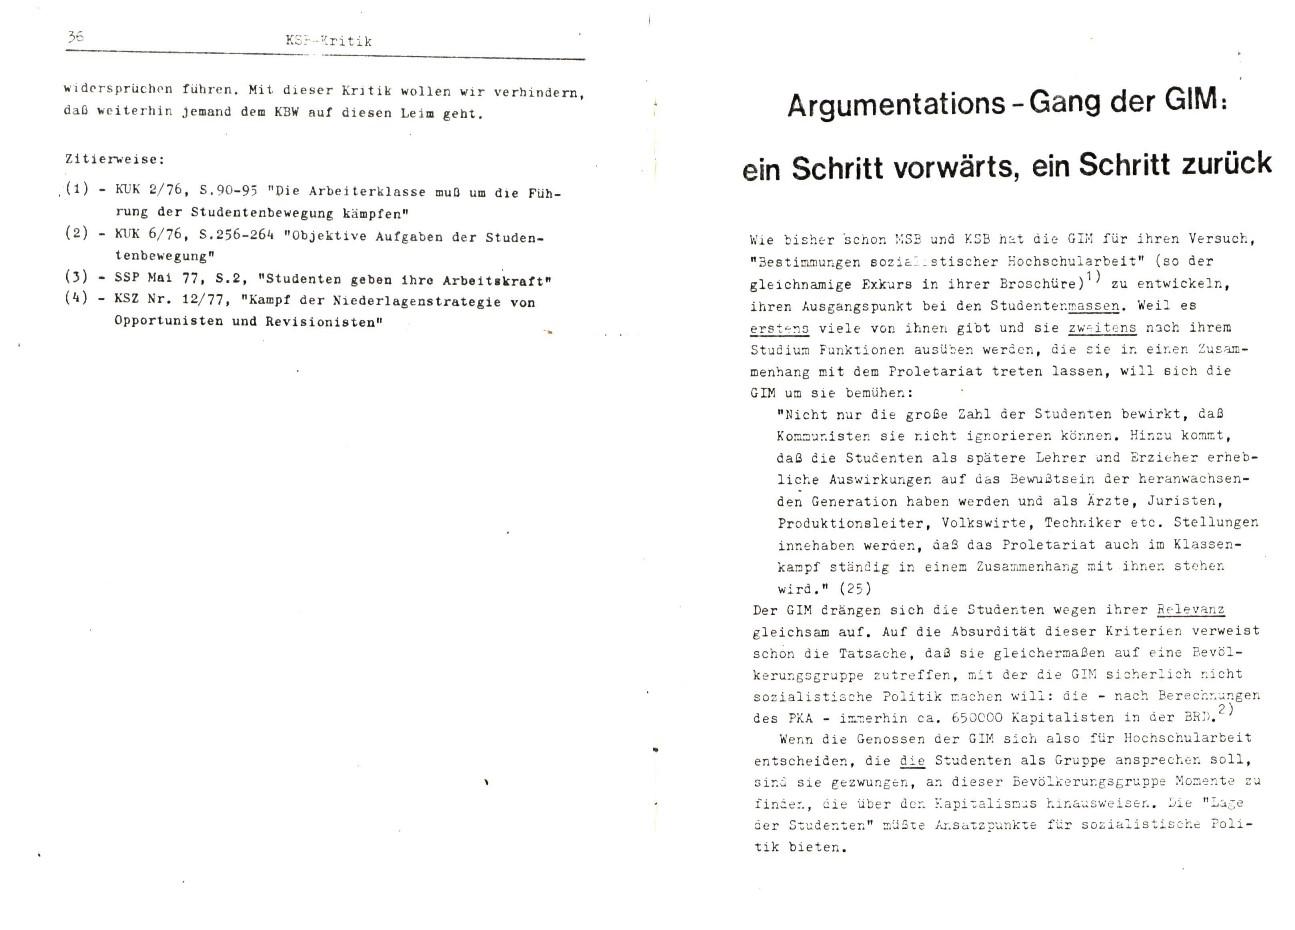 Muenster_SHO_1977_Studenteninteressen_19